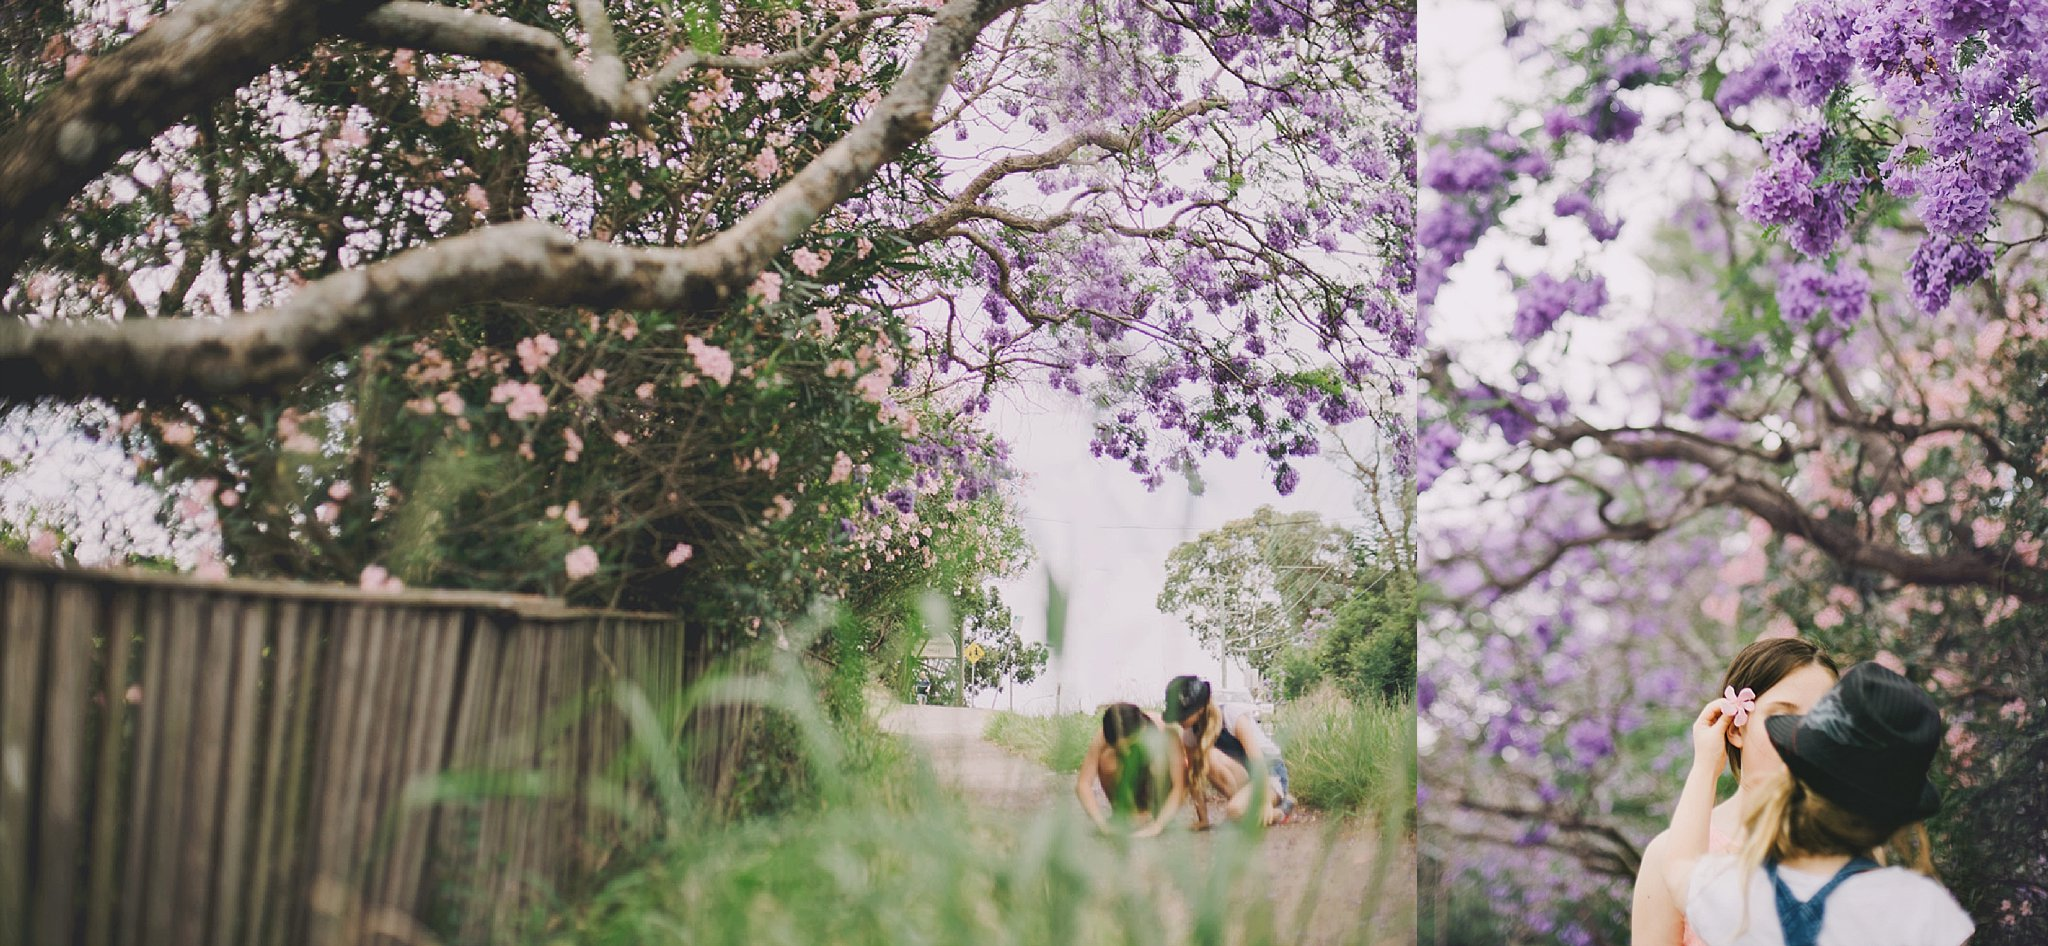 Flowering jacaranda in summer. The purple was admired during a school run.